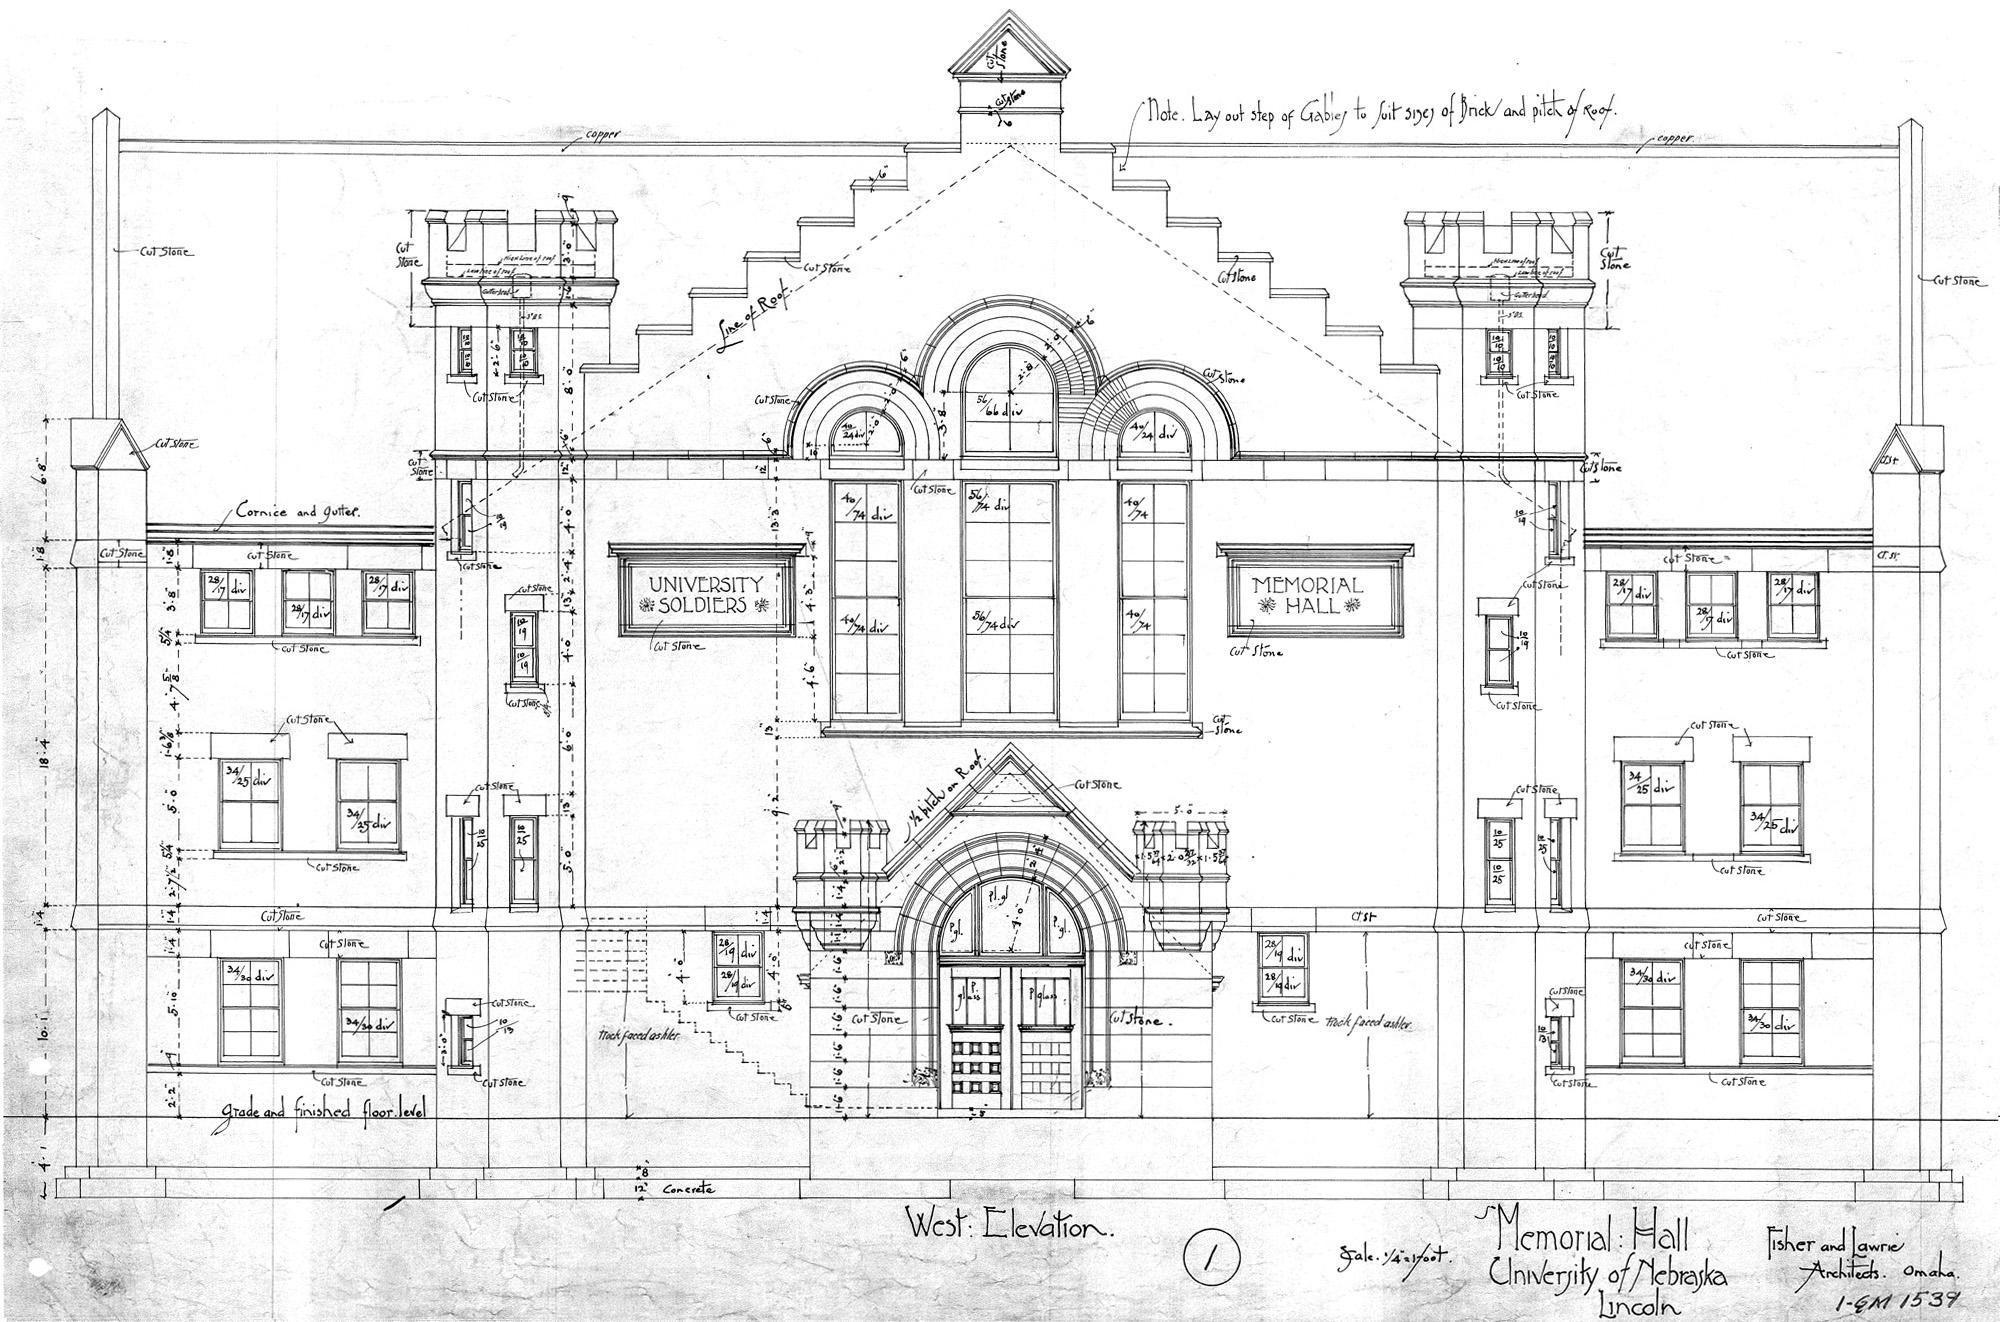 UNL Historic Buildings Grant Memorial Hall Building Plans